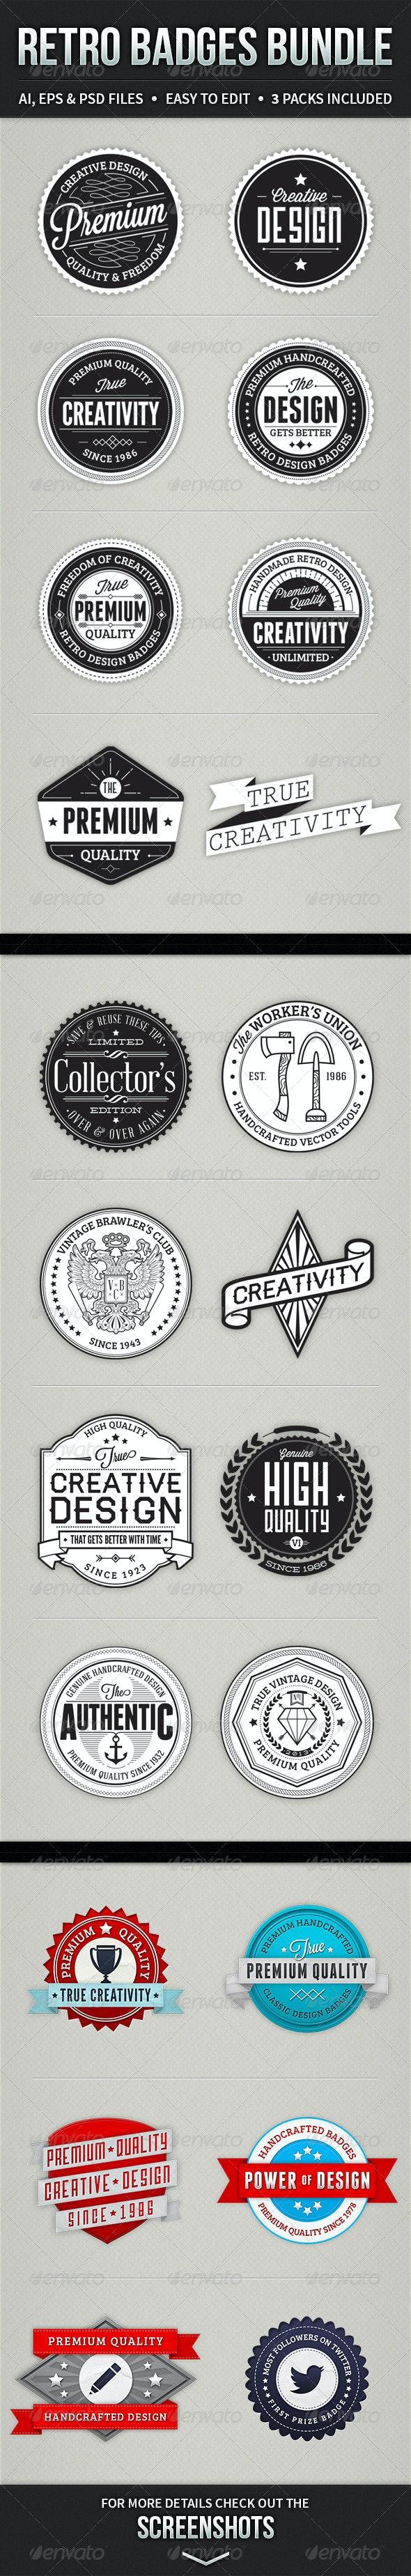 Retro Badges Bundle